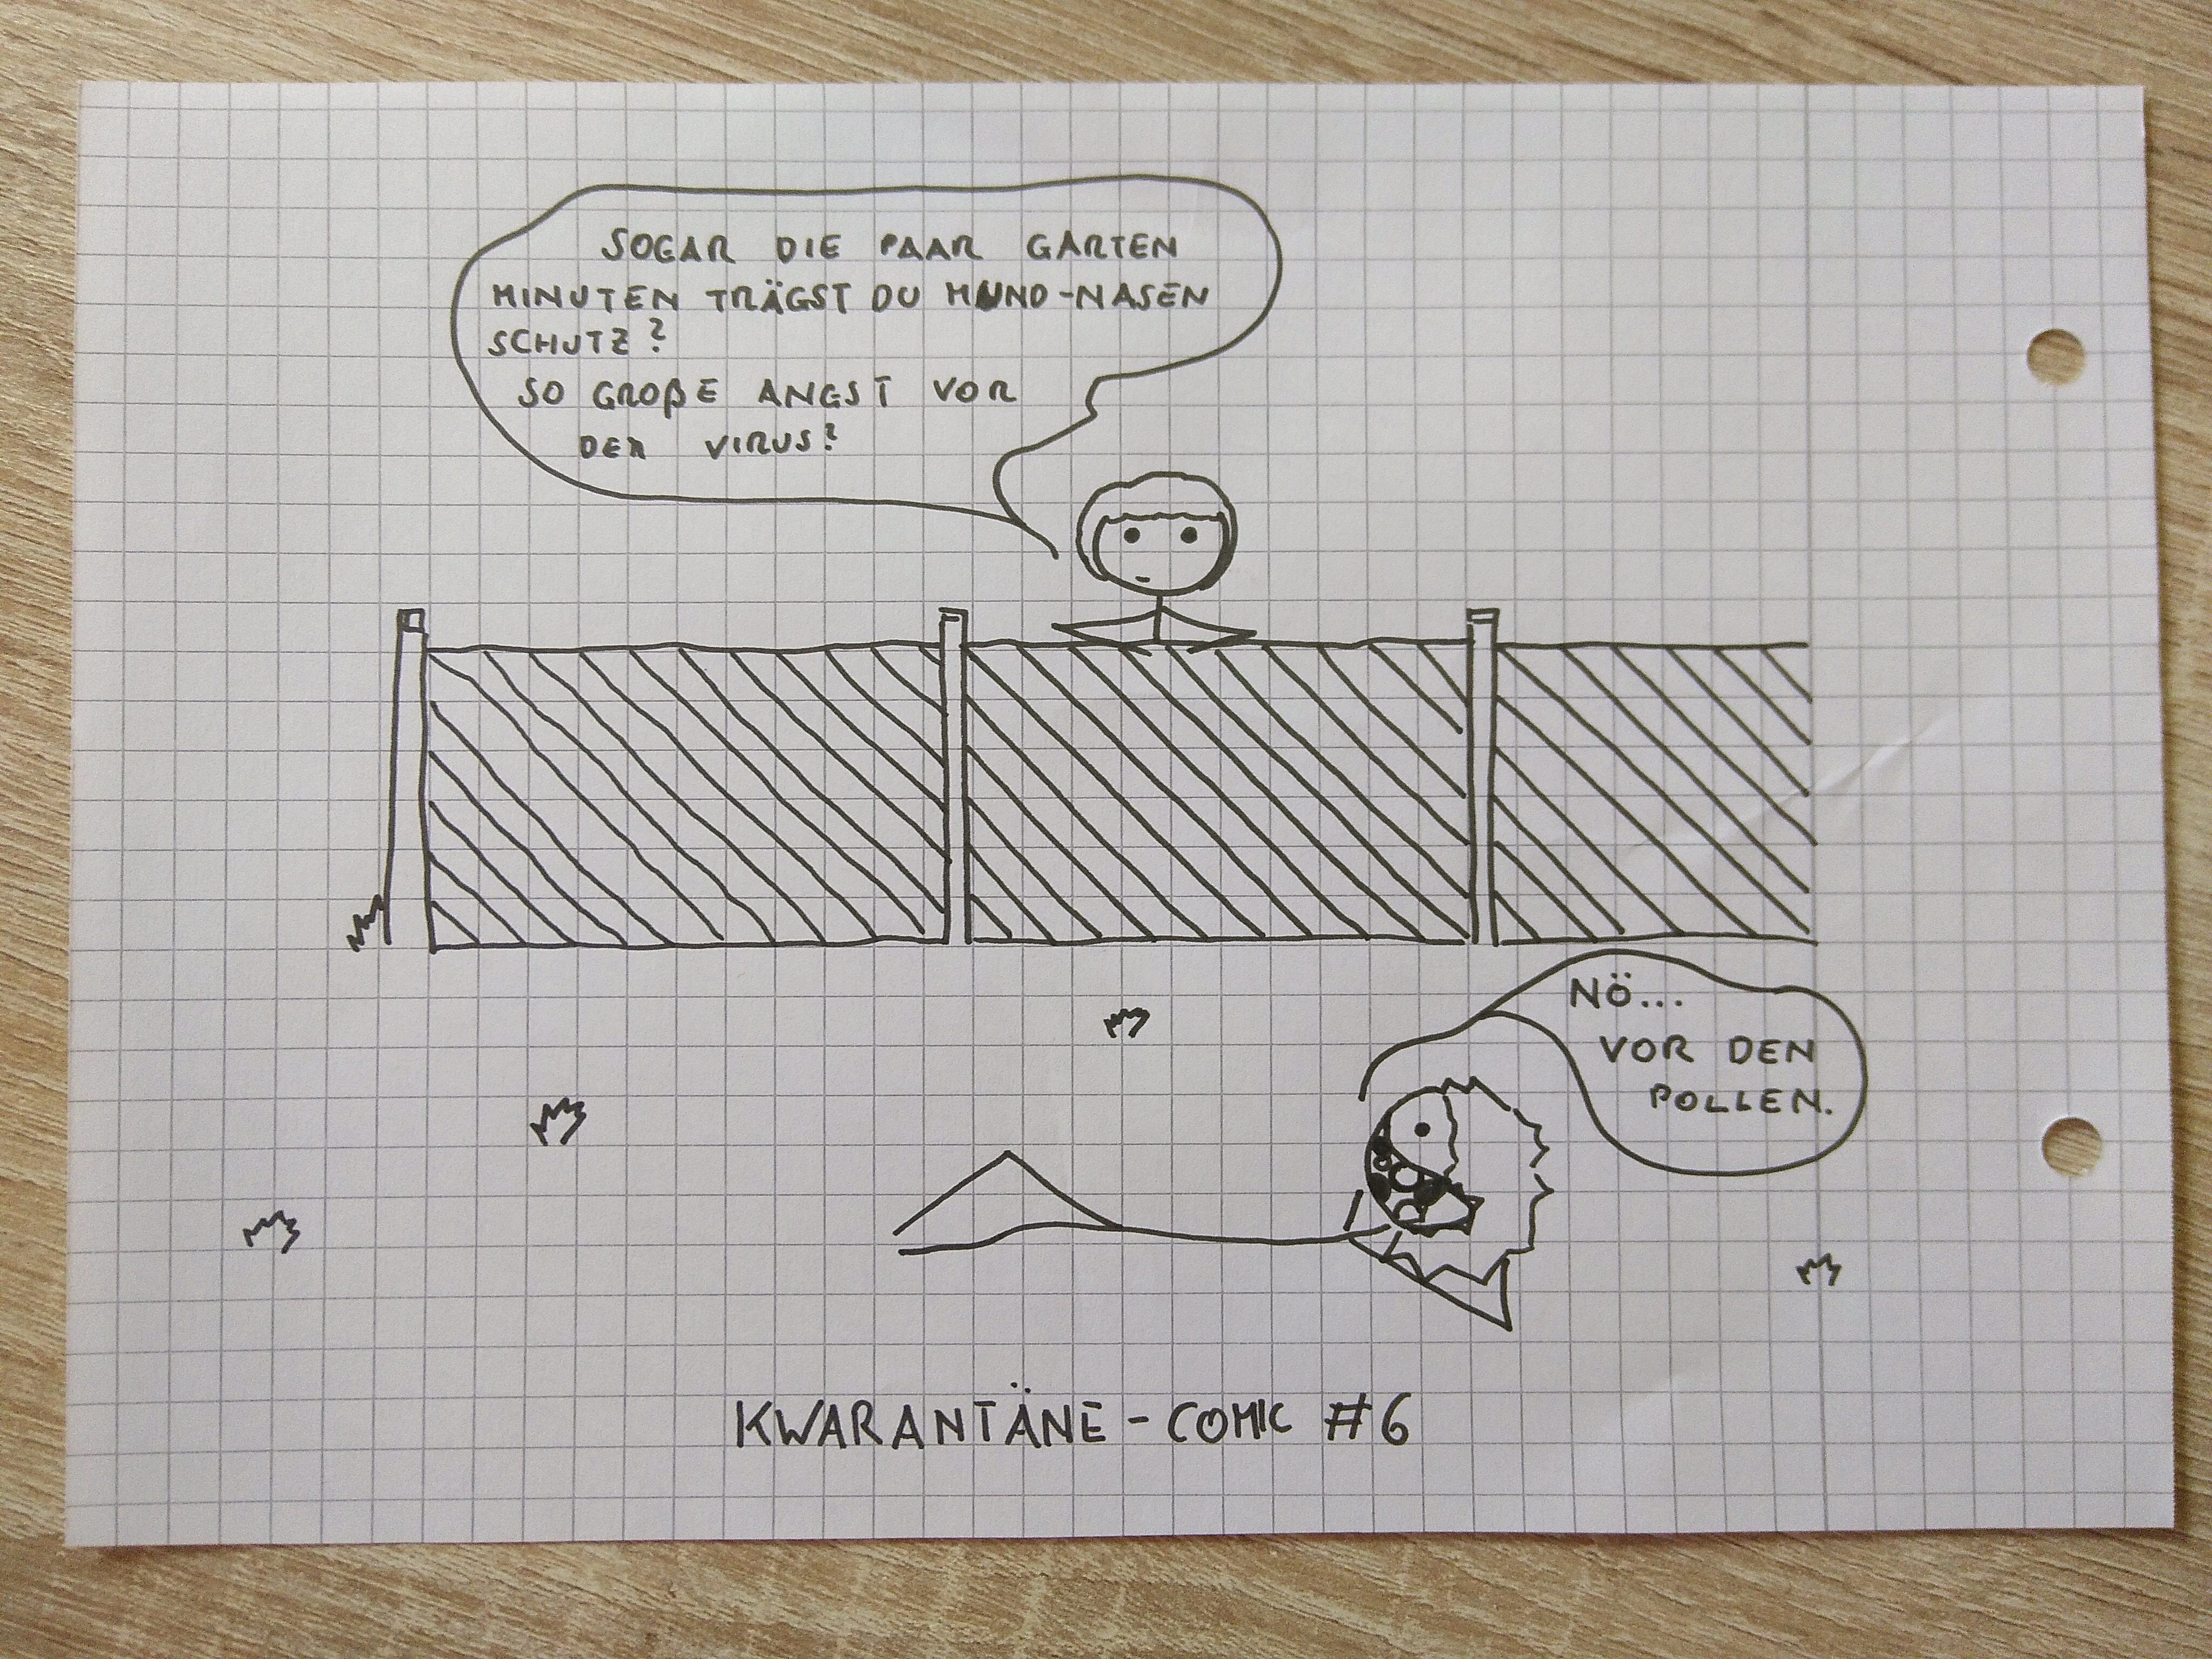 Kwarantäne Komik #6